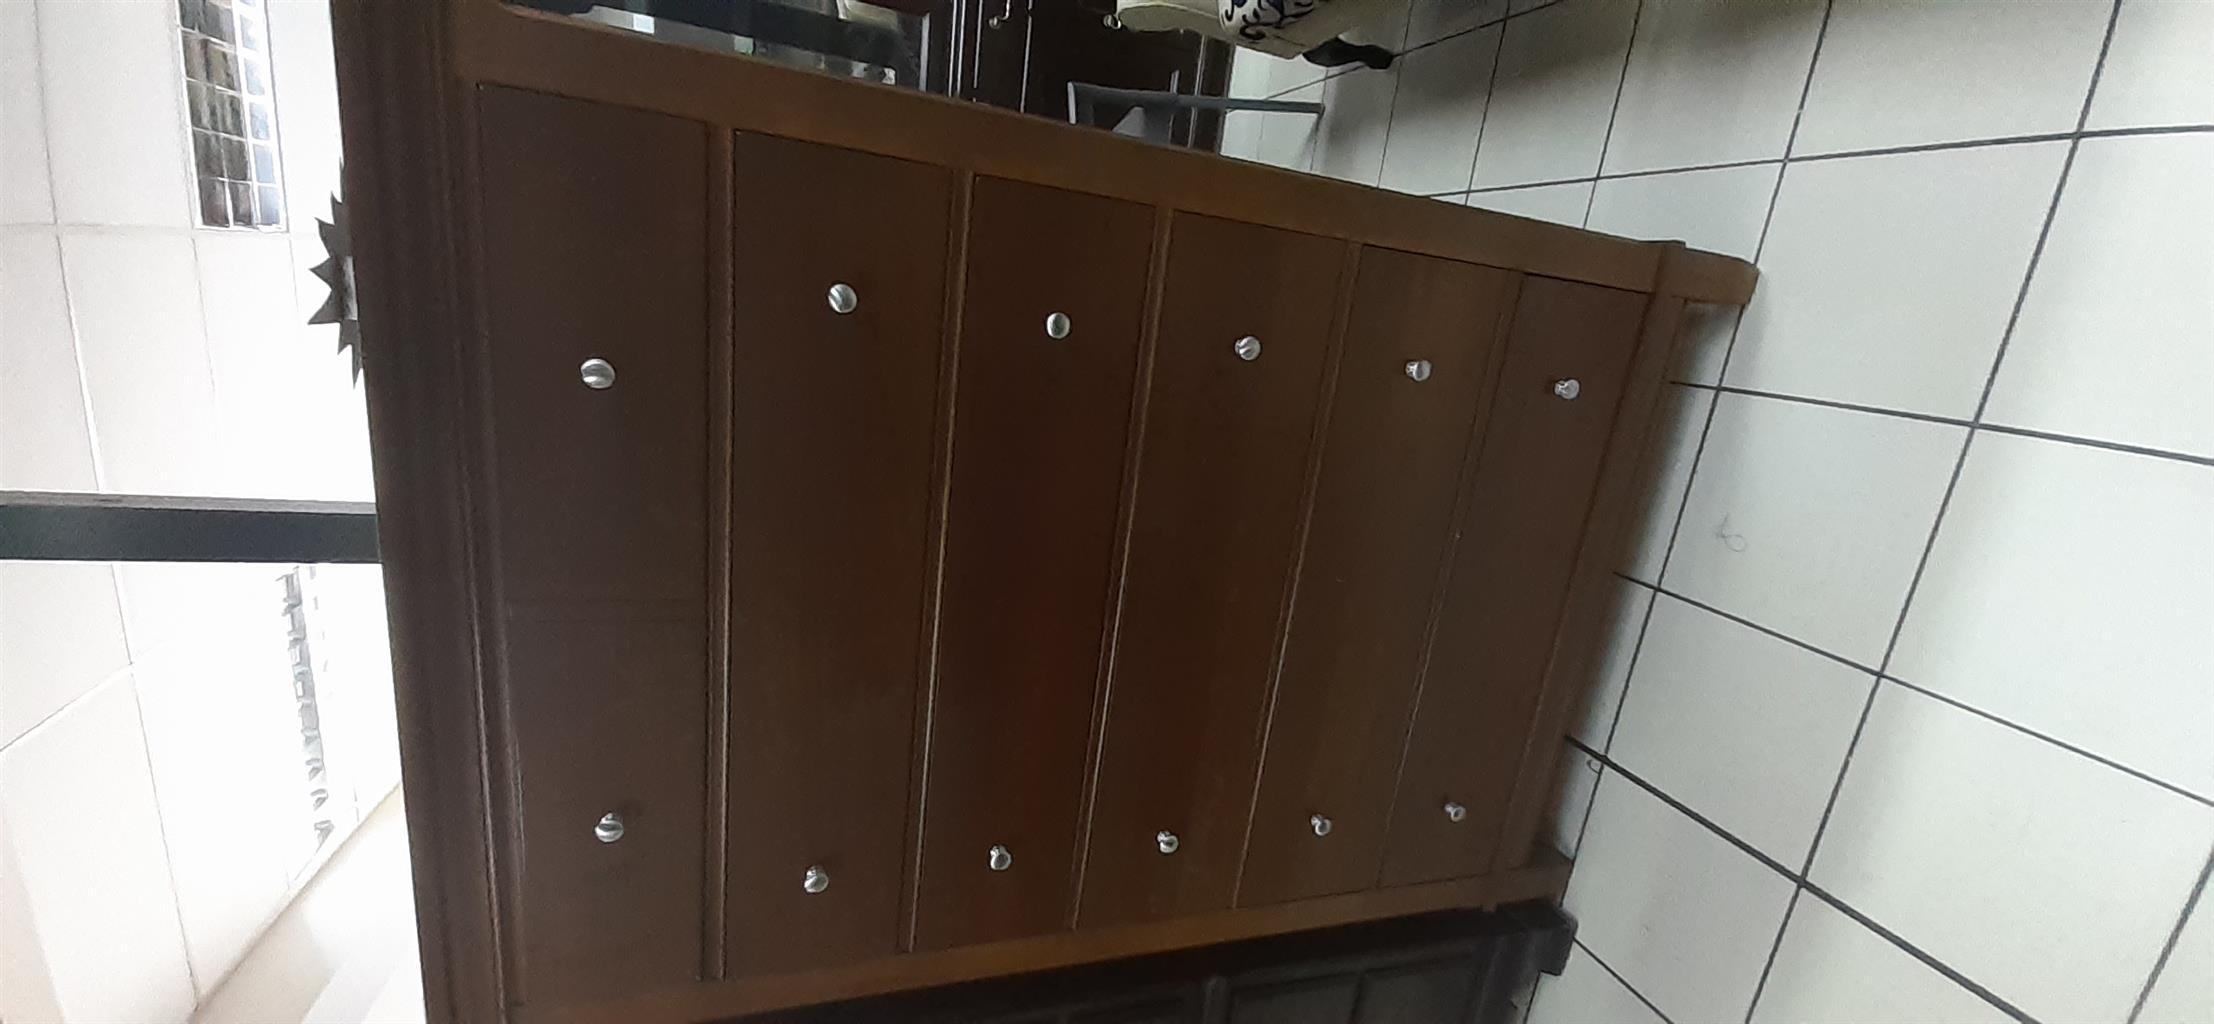 Thomasville Tallboy Cabinets.